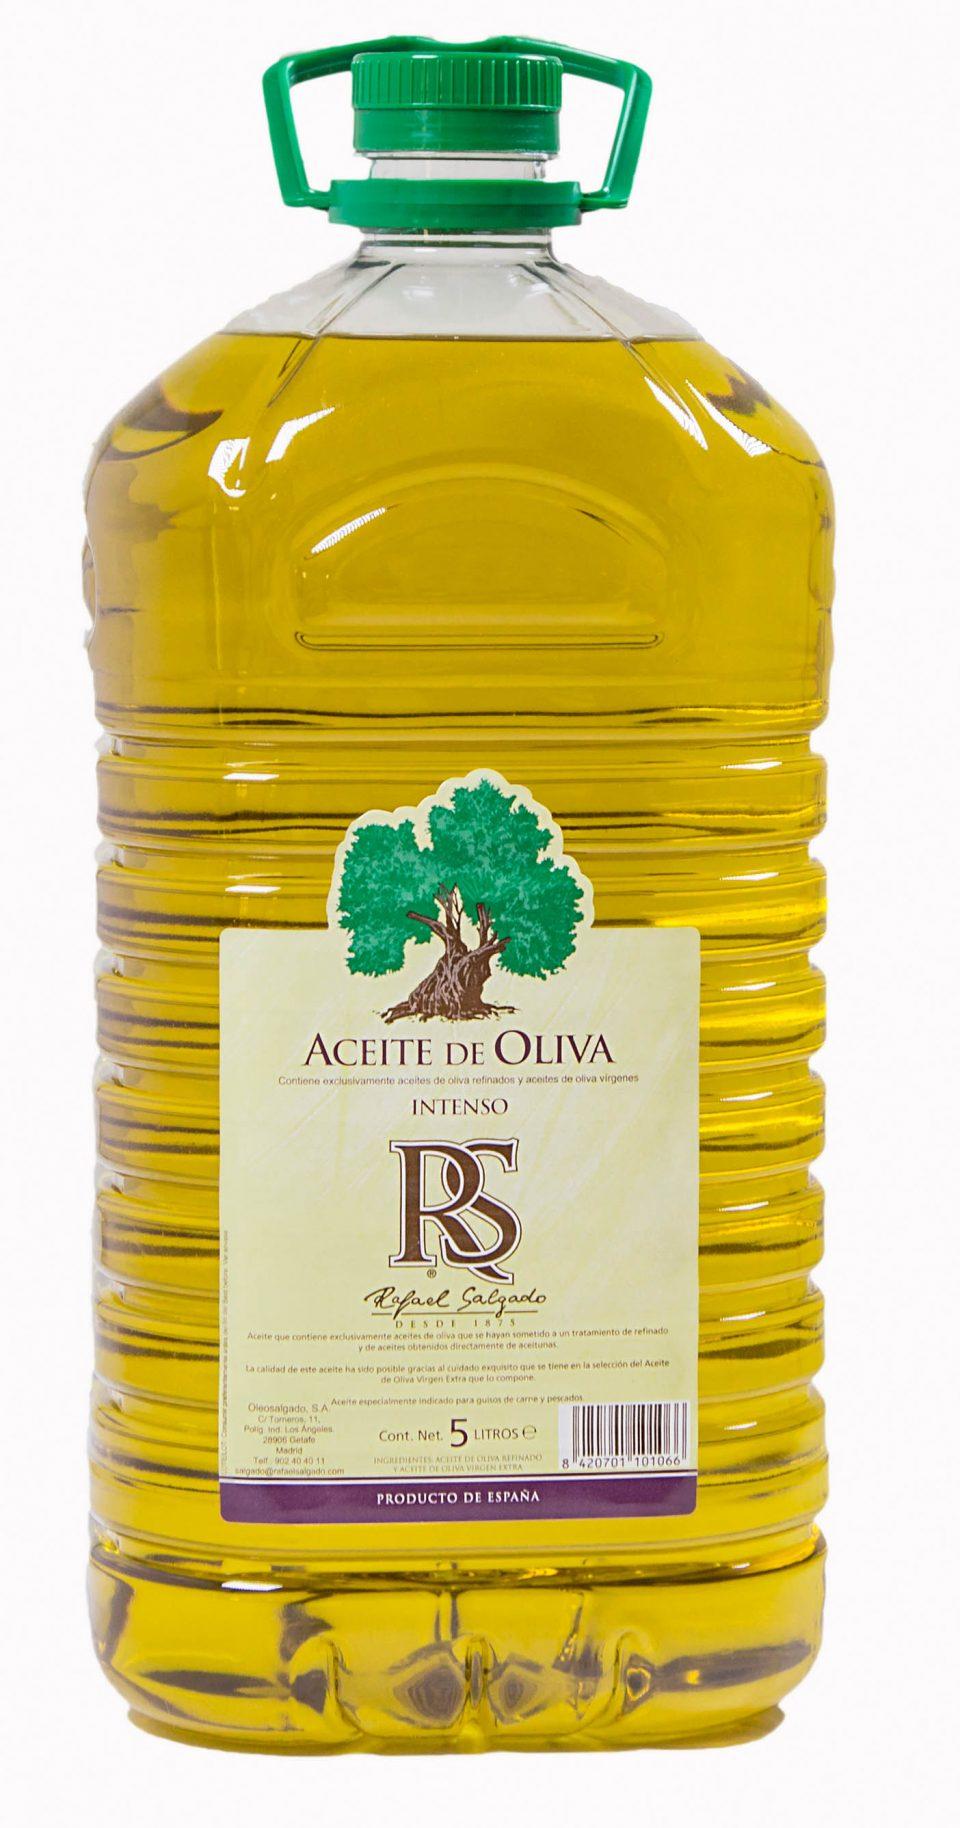 Aceite de Oliva Intenso 1º Bidón RS 5 litros